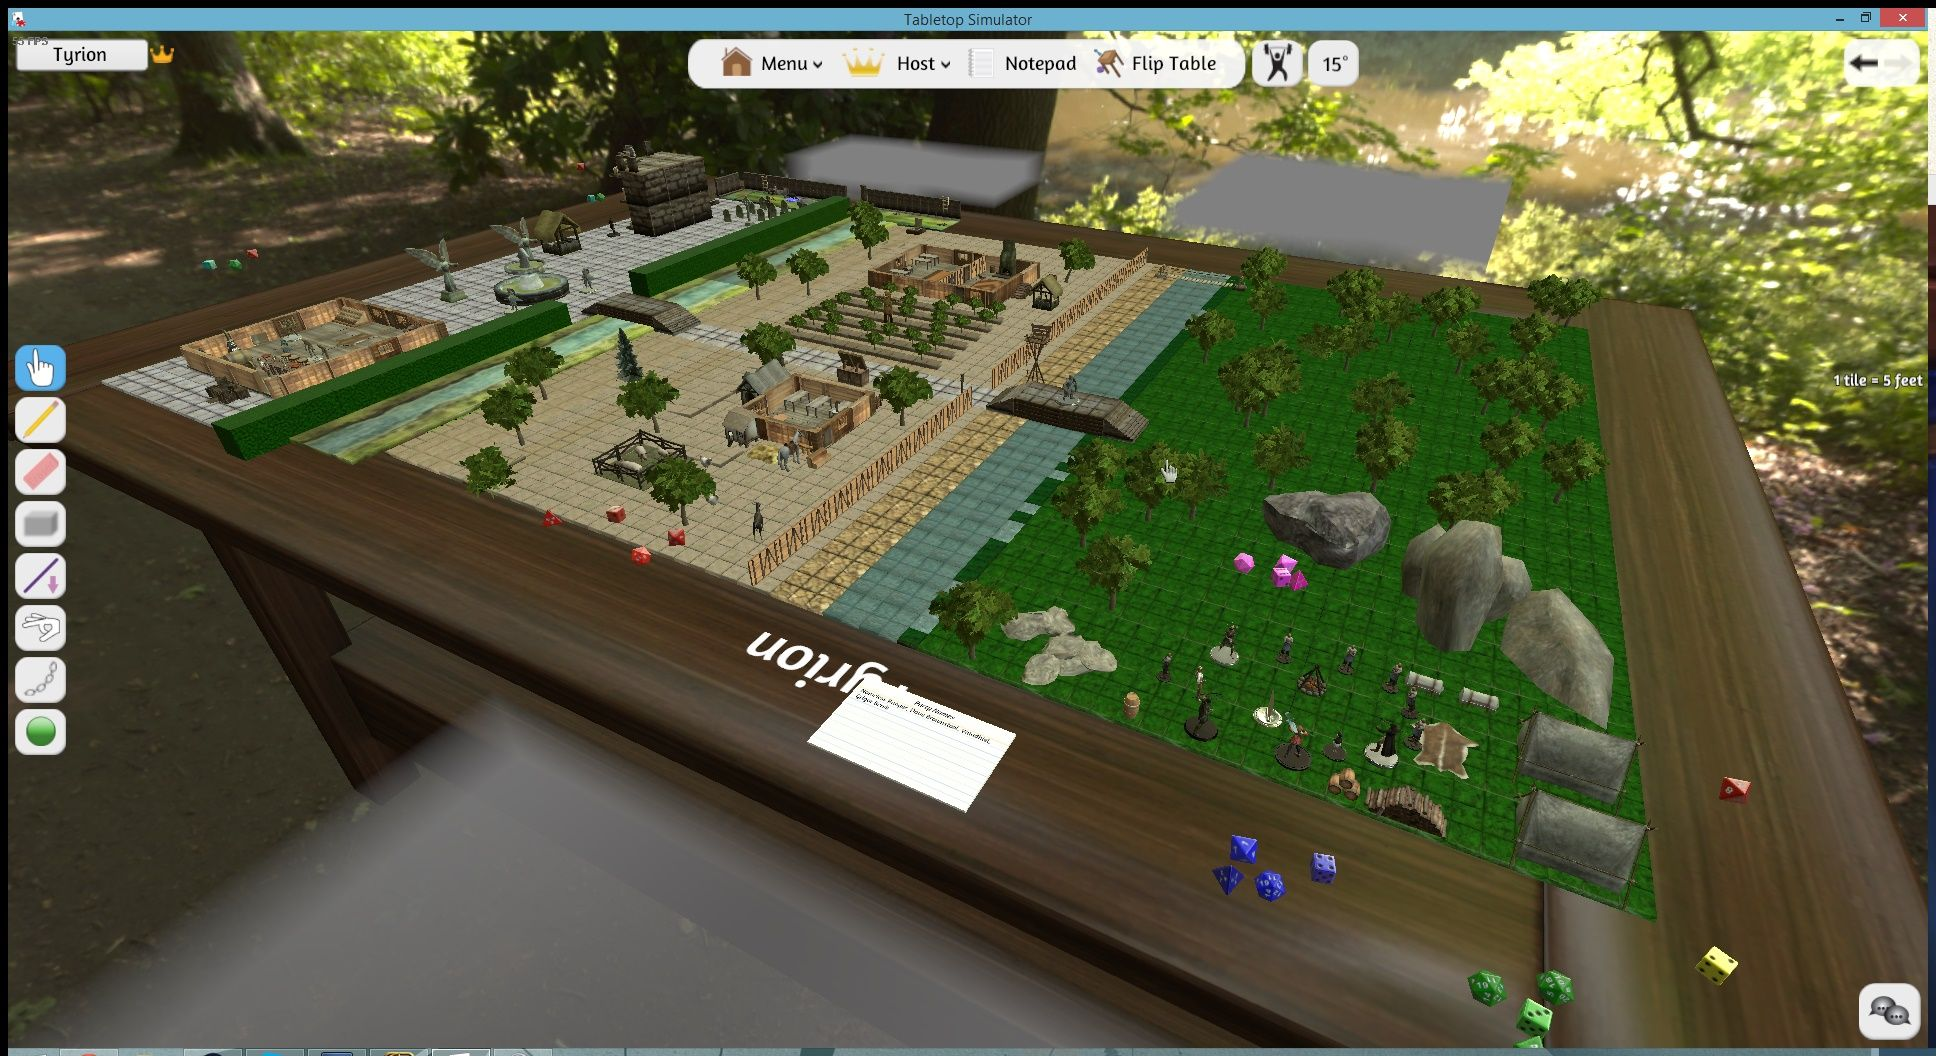 Pin by Matt Burdick on RPG Encounter Maps | Home decor